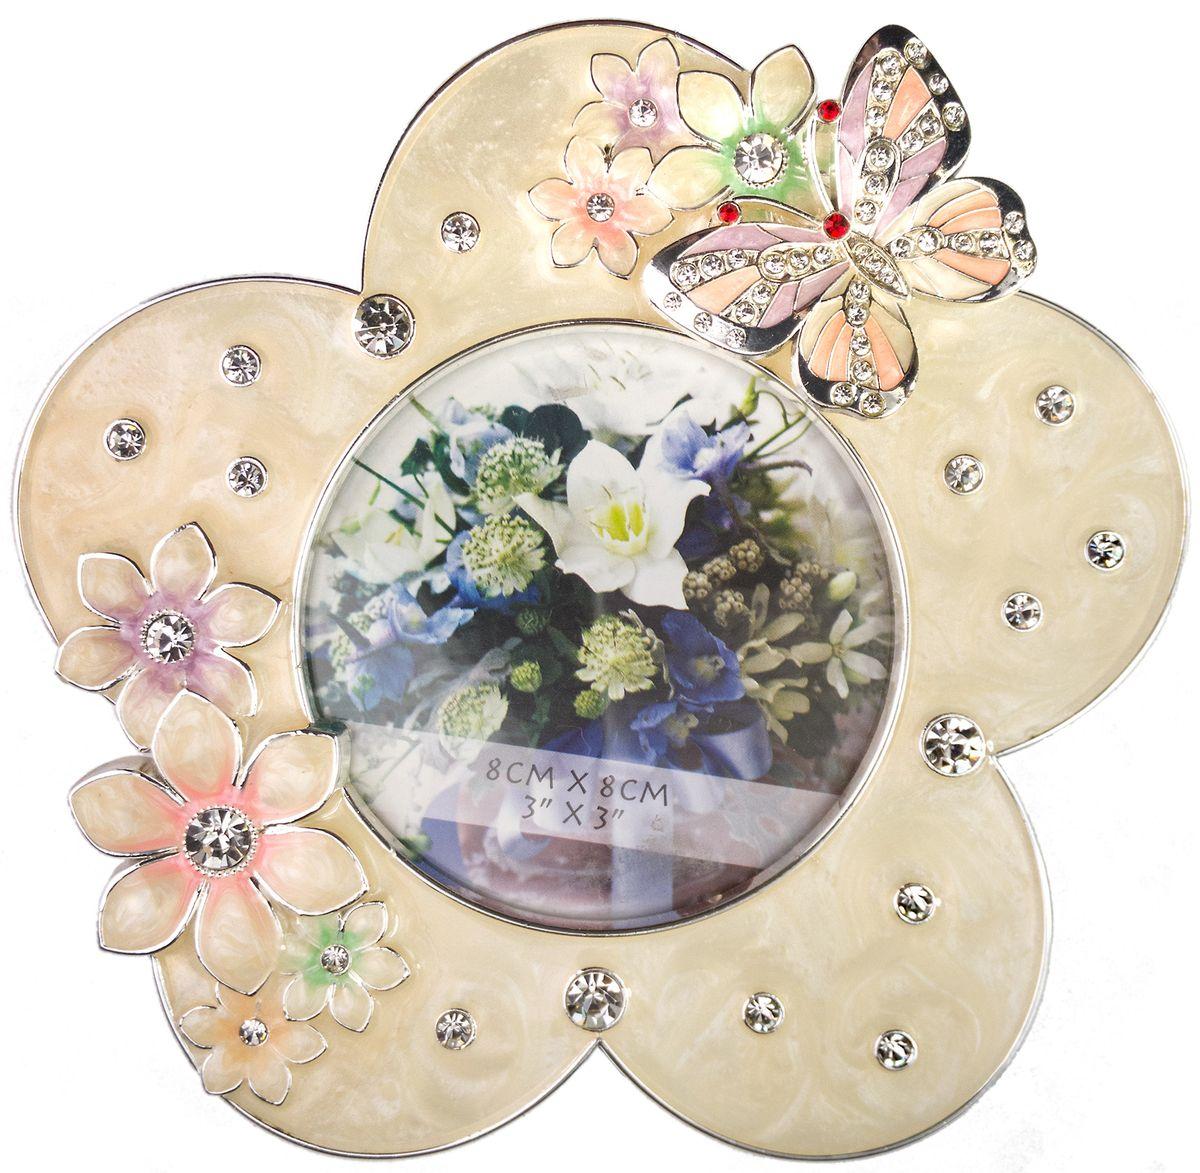 Фоторамка-мини декоративная Platinum Цветы, 8 х 8 см. PF10562B-3PLATINUM PF10562B-3